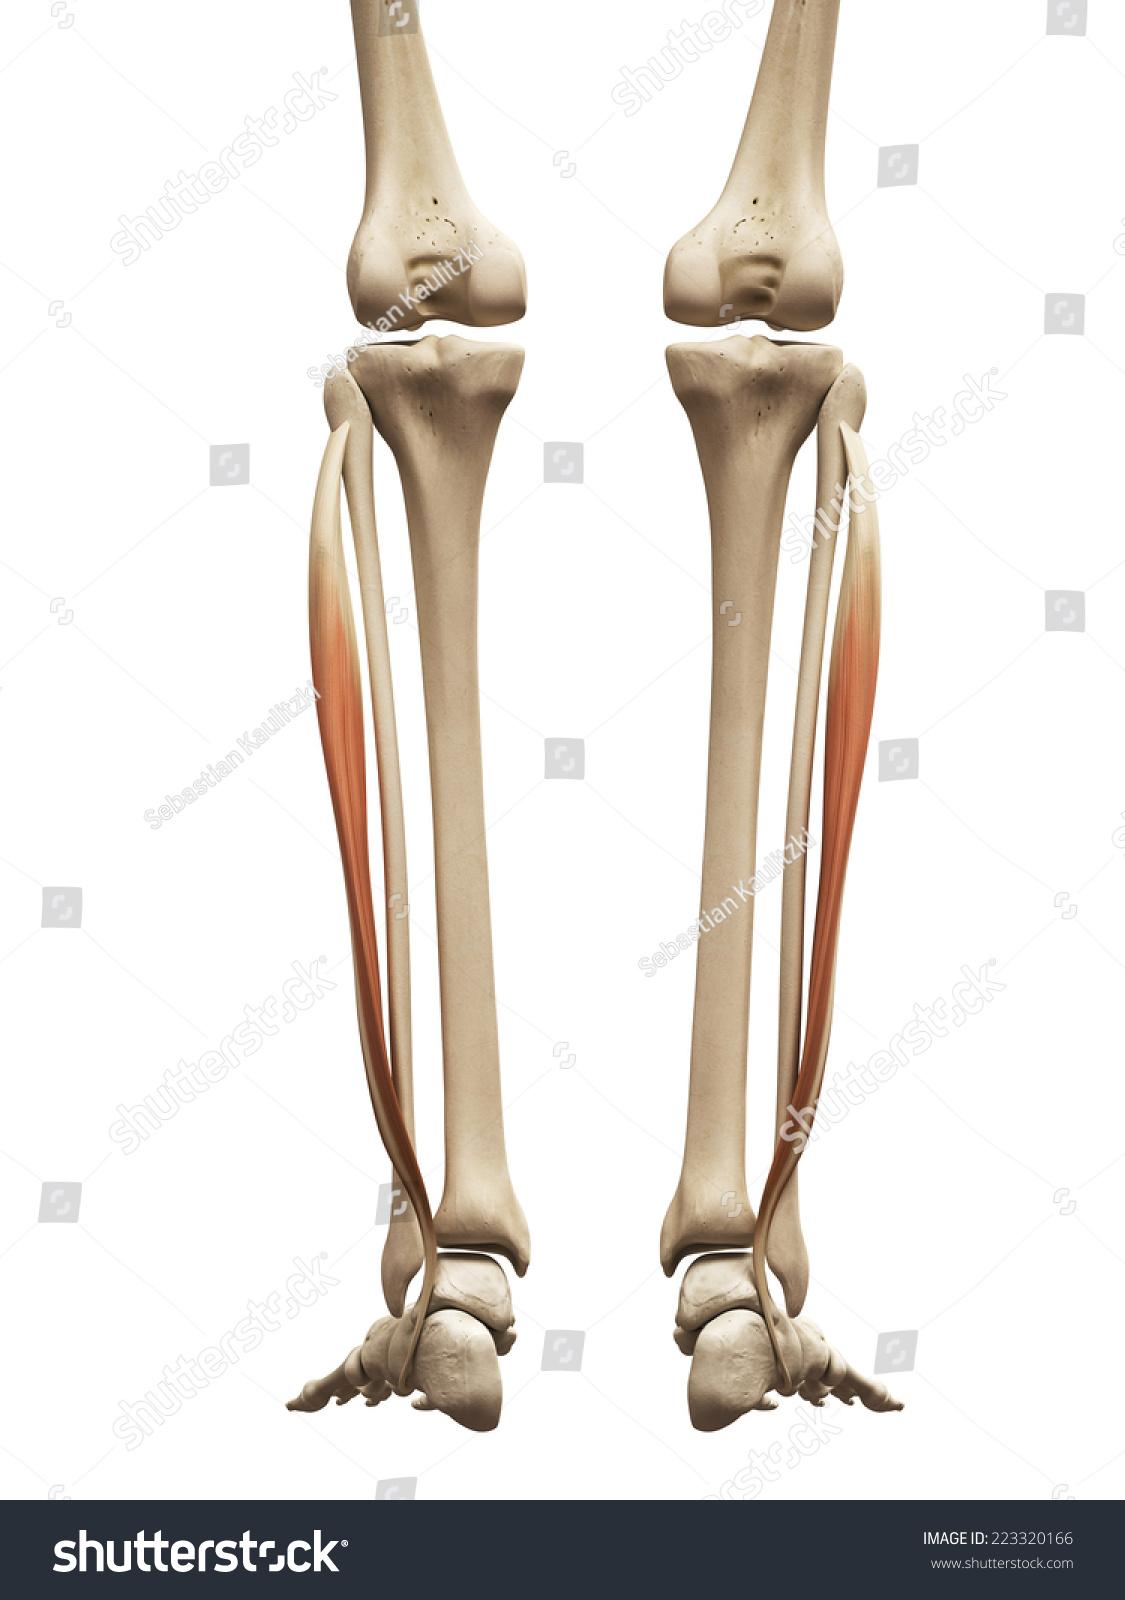 Muscle Anatomy Fibularis Longus Stock Illustration 223320166 ...